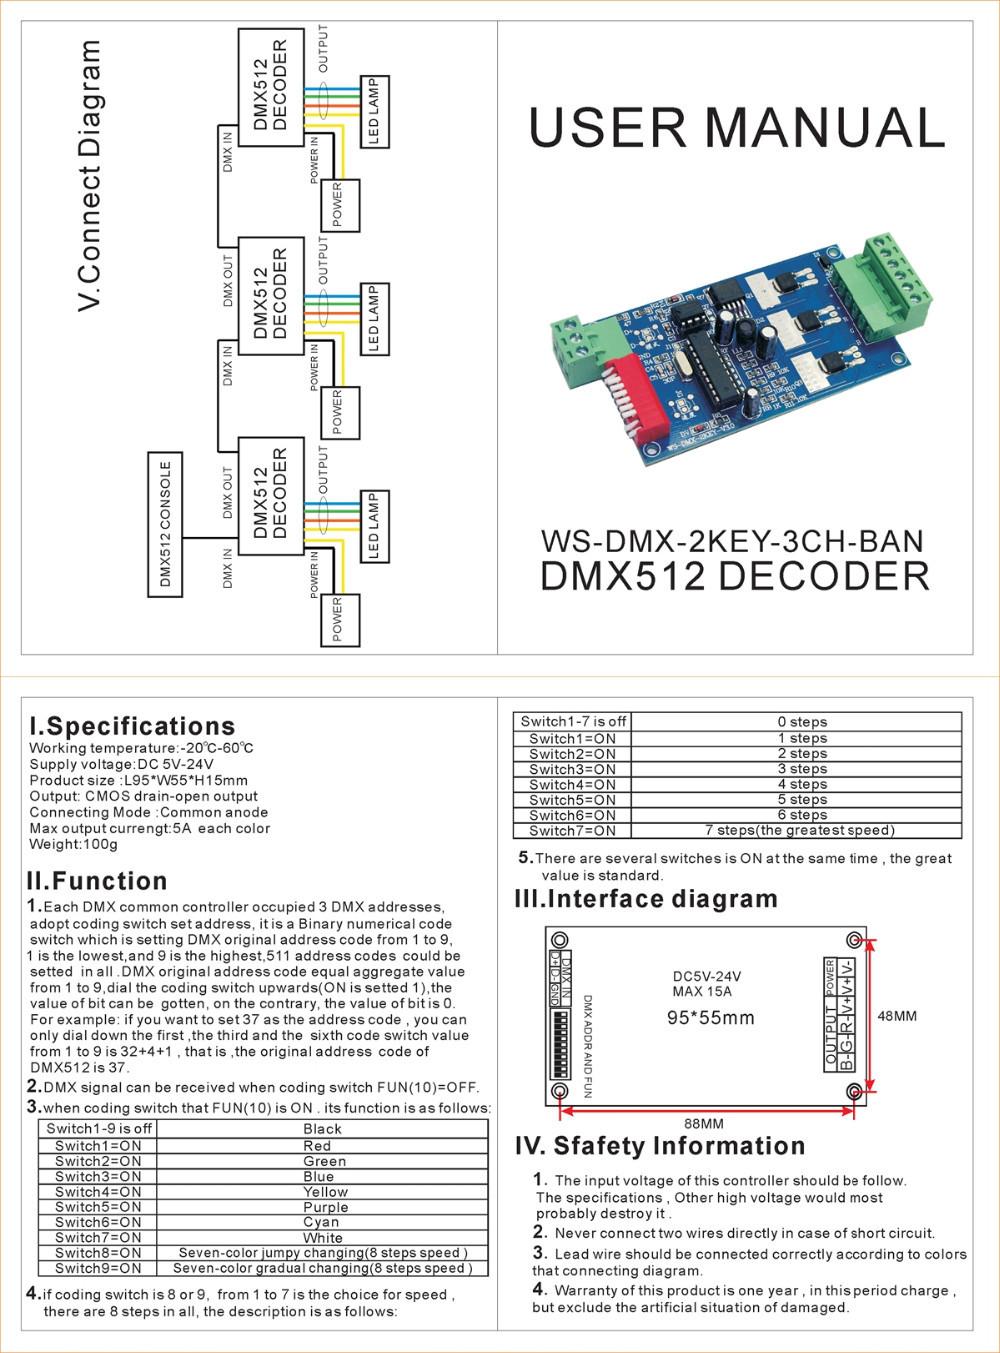 New_DMX_Controllers_WSDMX_2KEY_3CH_BAN_1